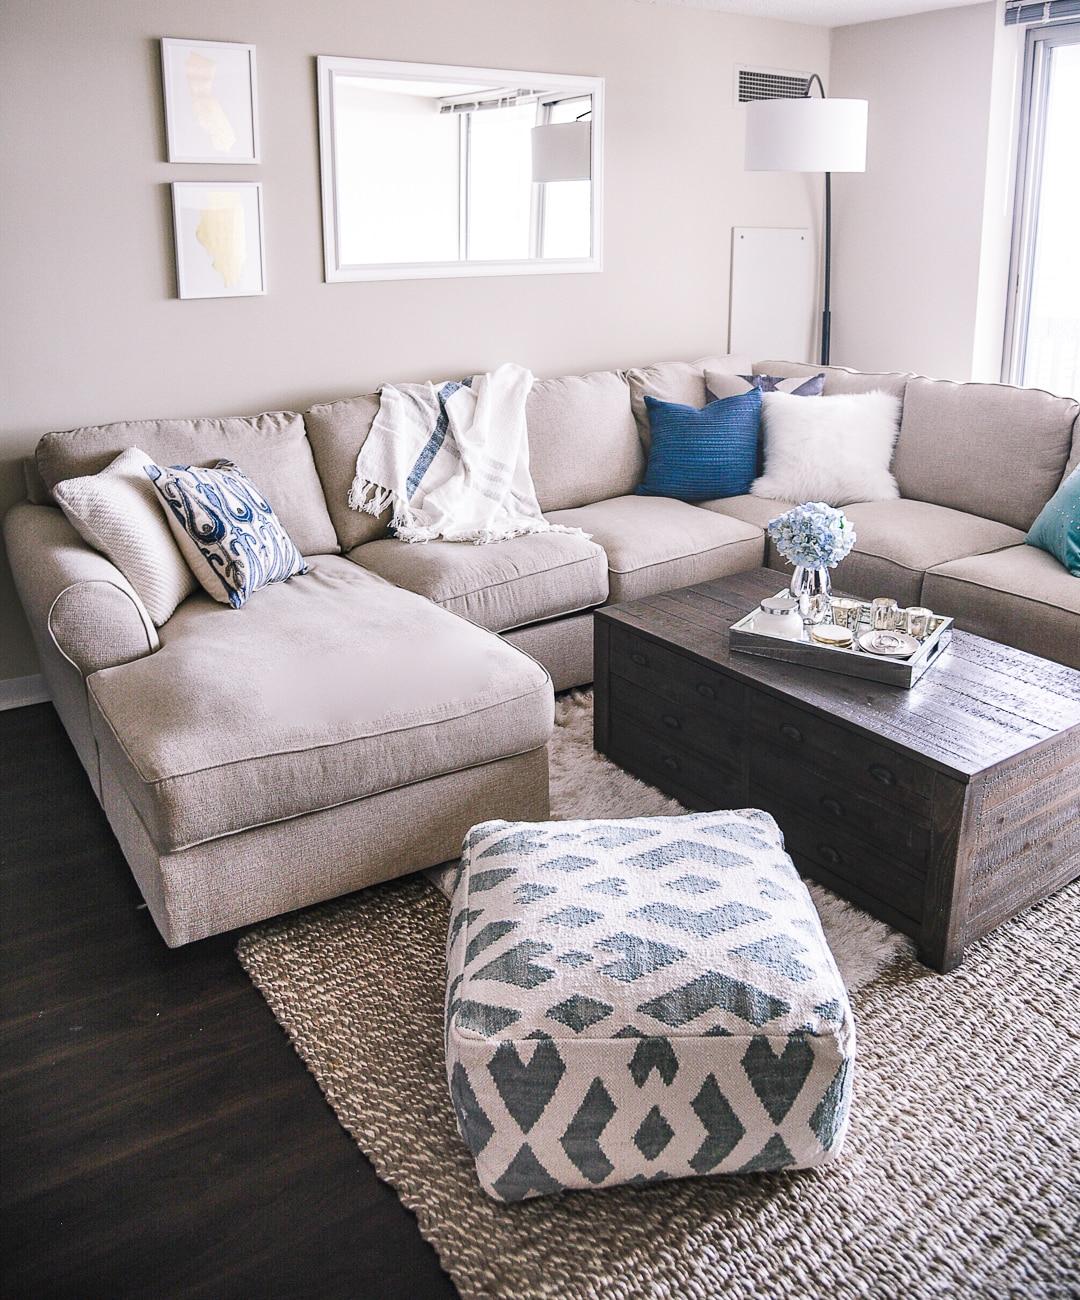 Spring Living Room Refresh With Jenna Colgrove Xo Ashley